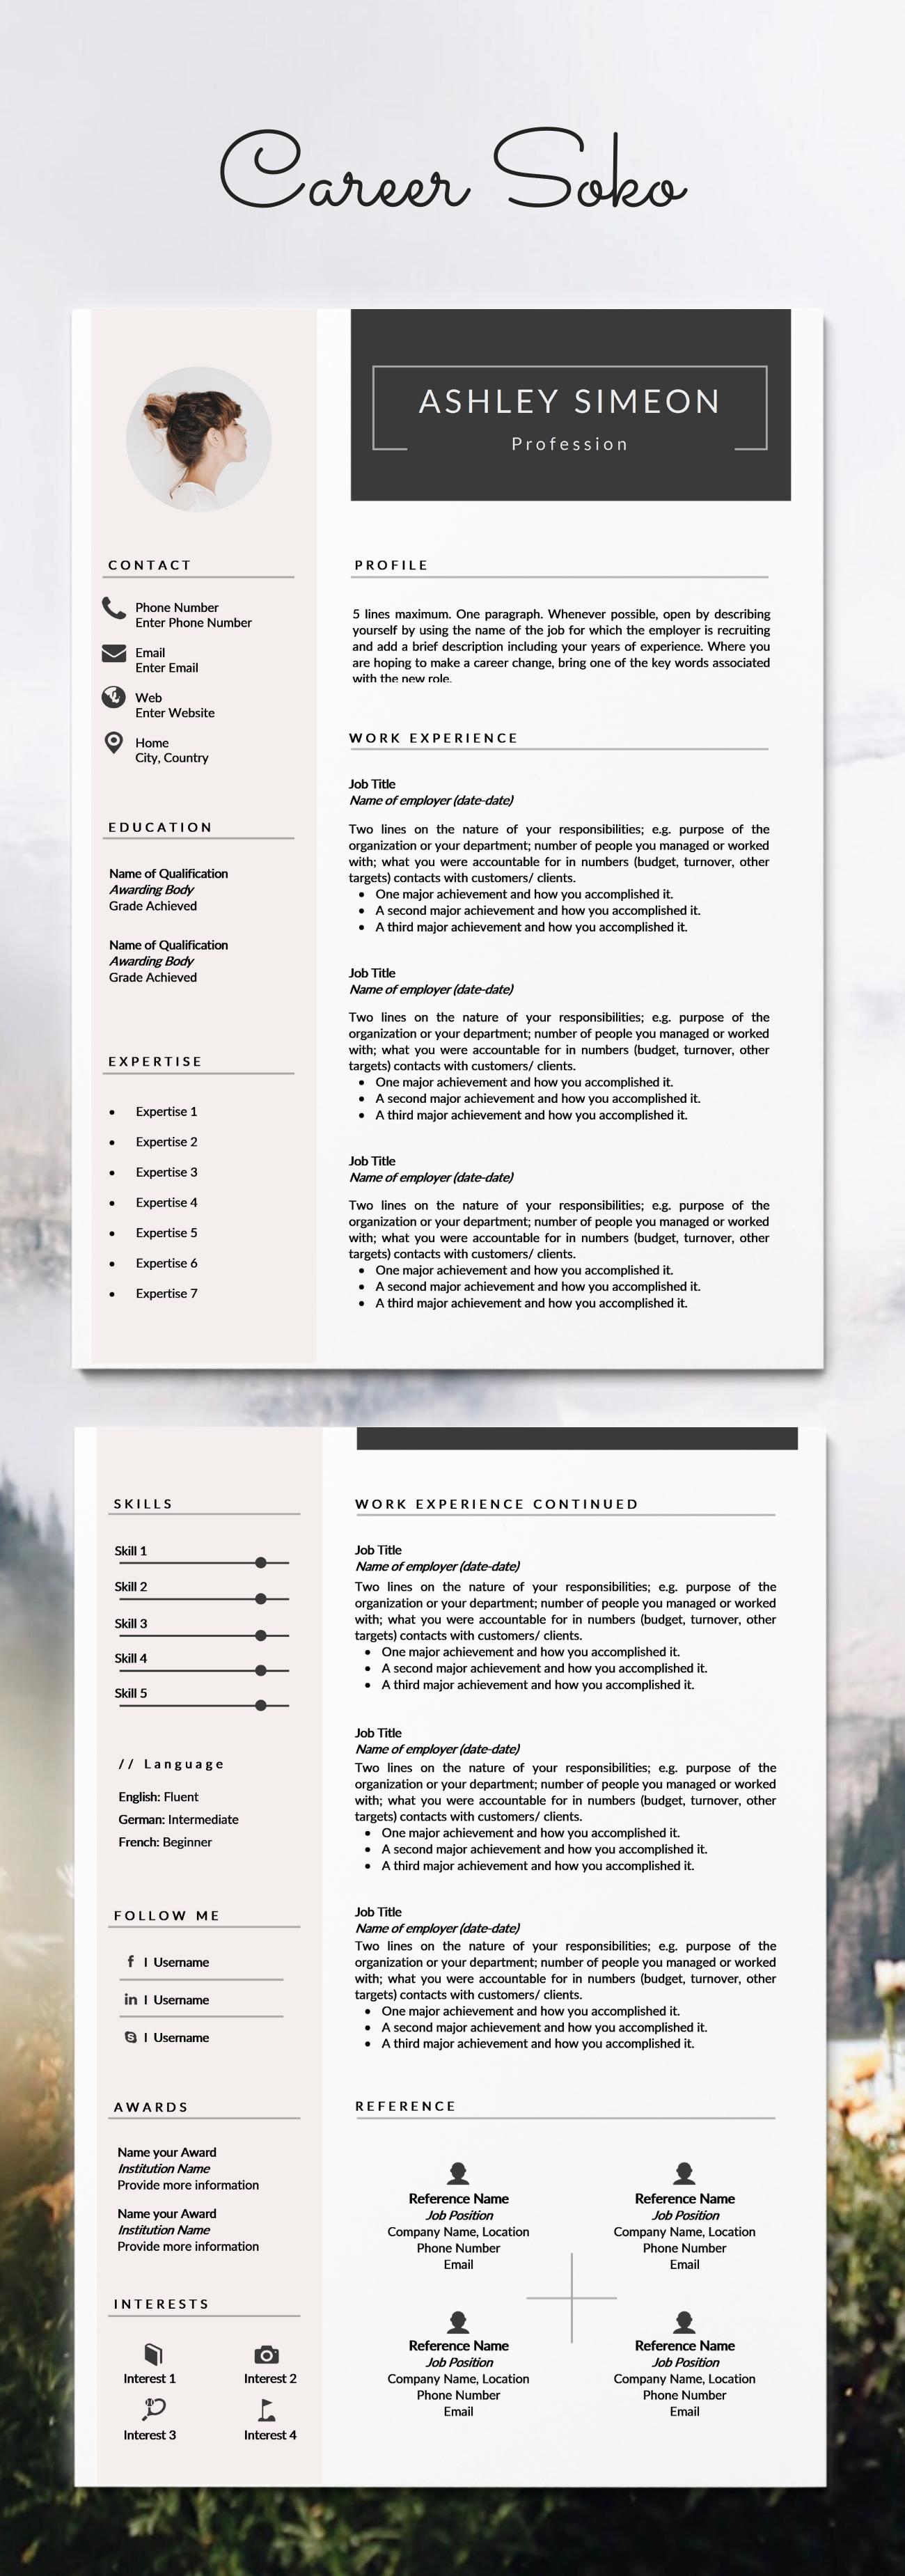 Minimalist Resume 2 Page Resume Template Cv Template Etsy Desain Cv Cv Kreatif Brosur